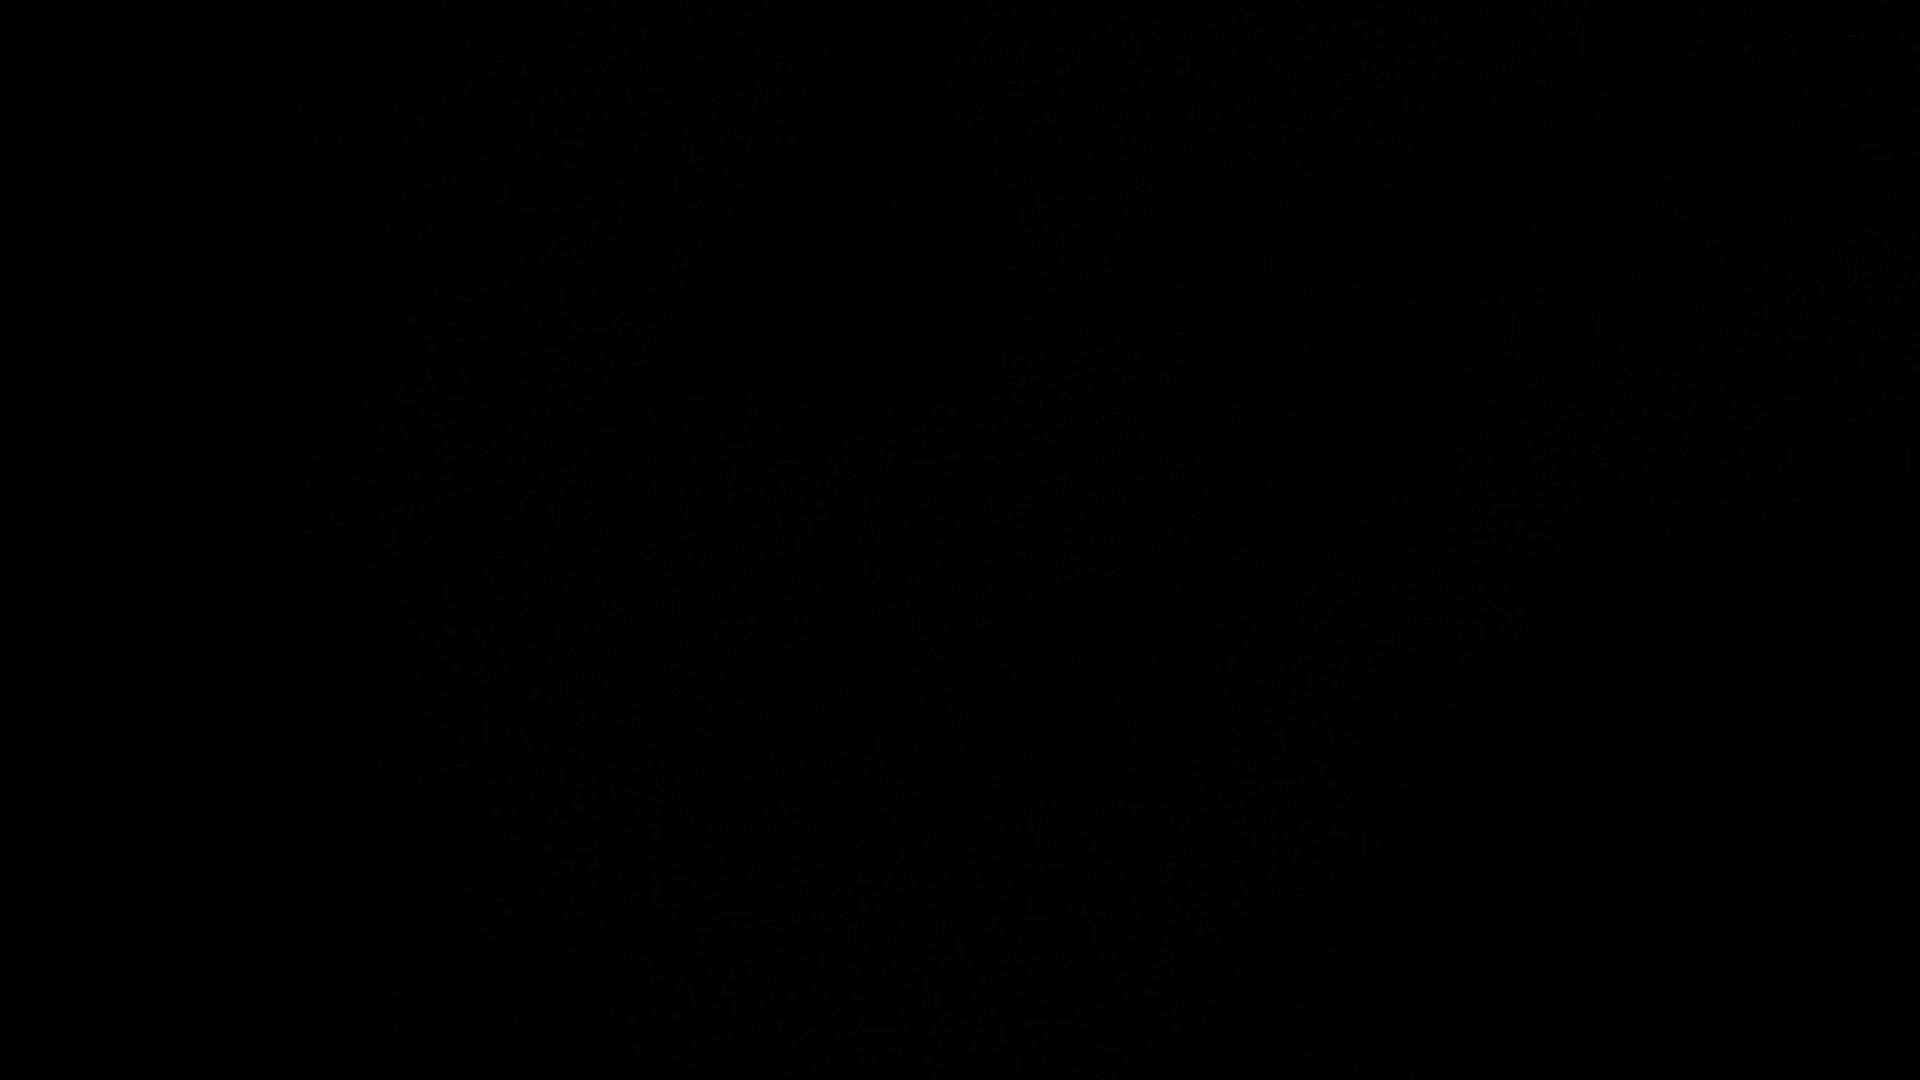 芸術大学ガチ潜入盗撮 JD盗撮 美女の洗面所の秘密 Vol.80 美肌 スケベ動画紹介 69画像 65